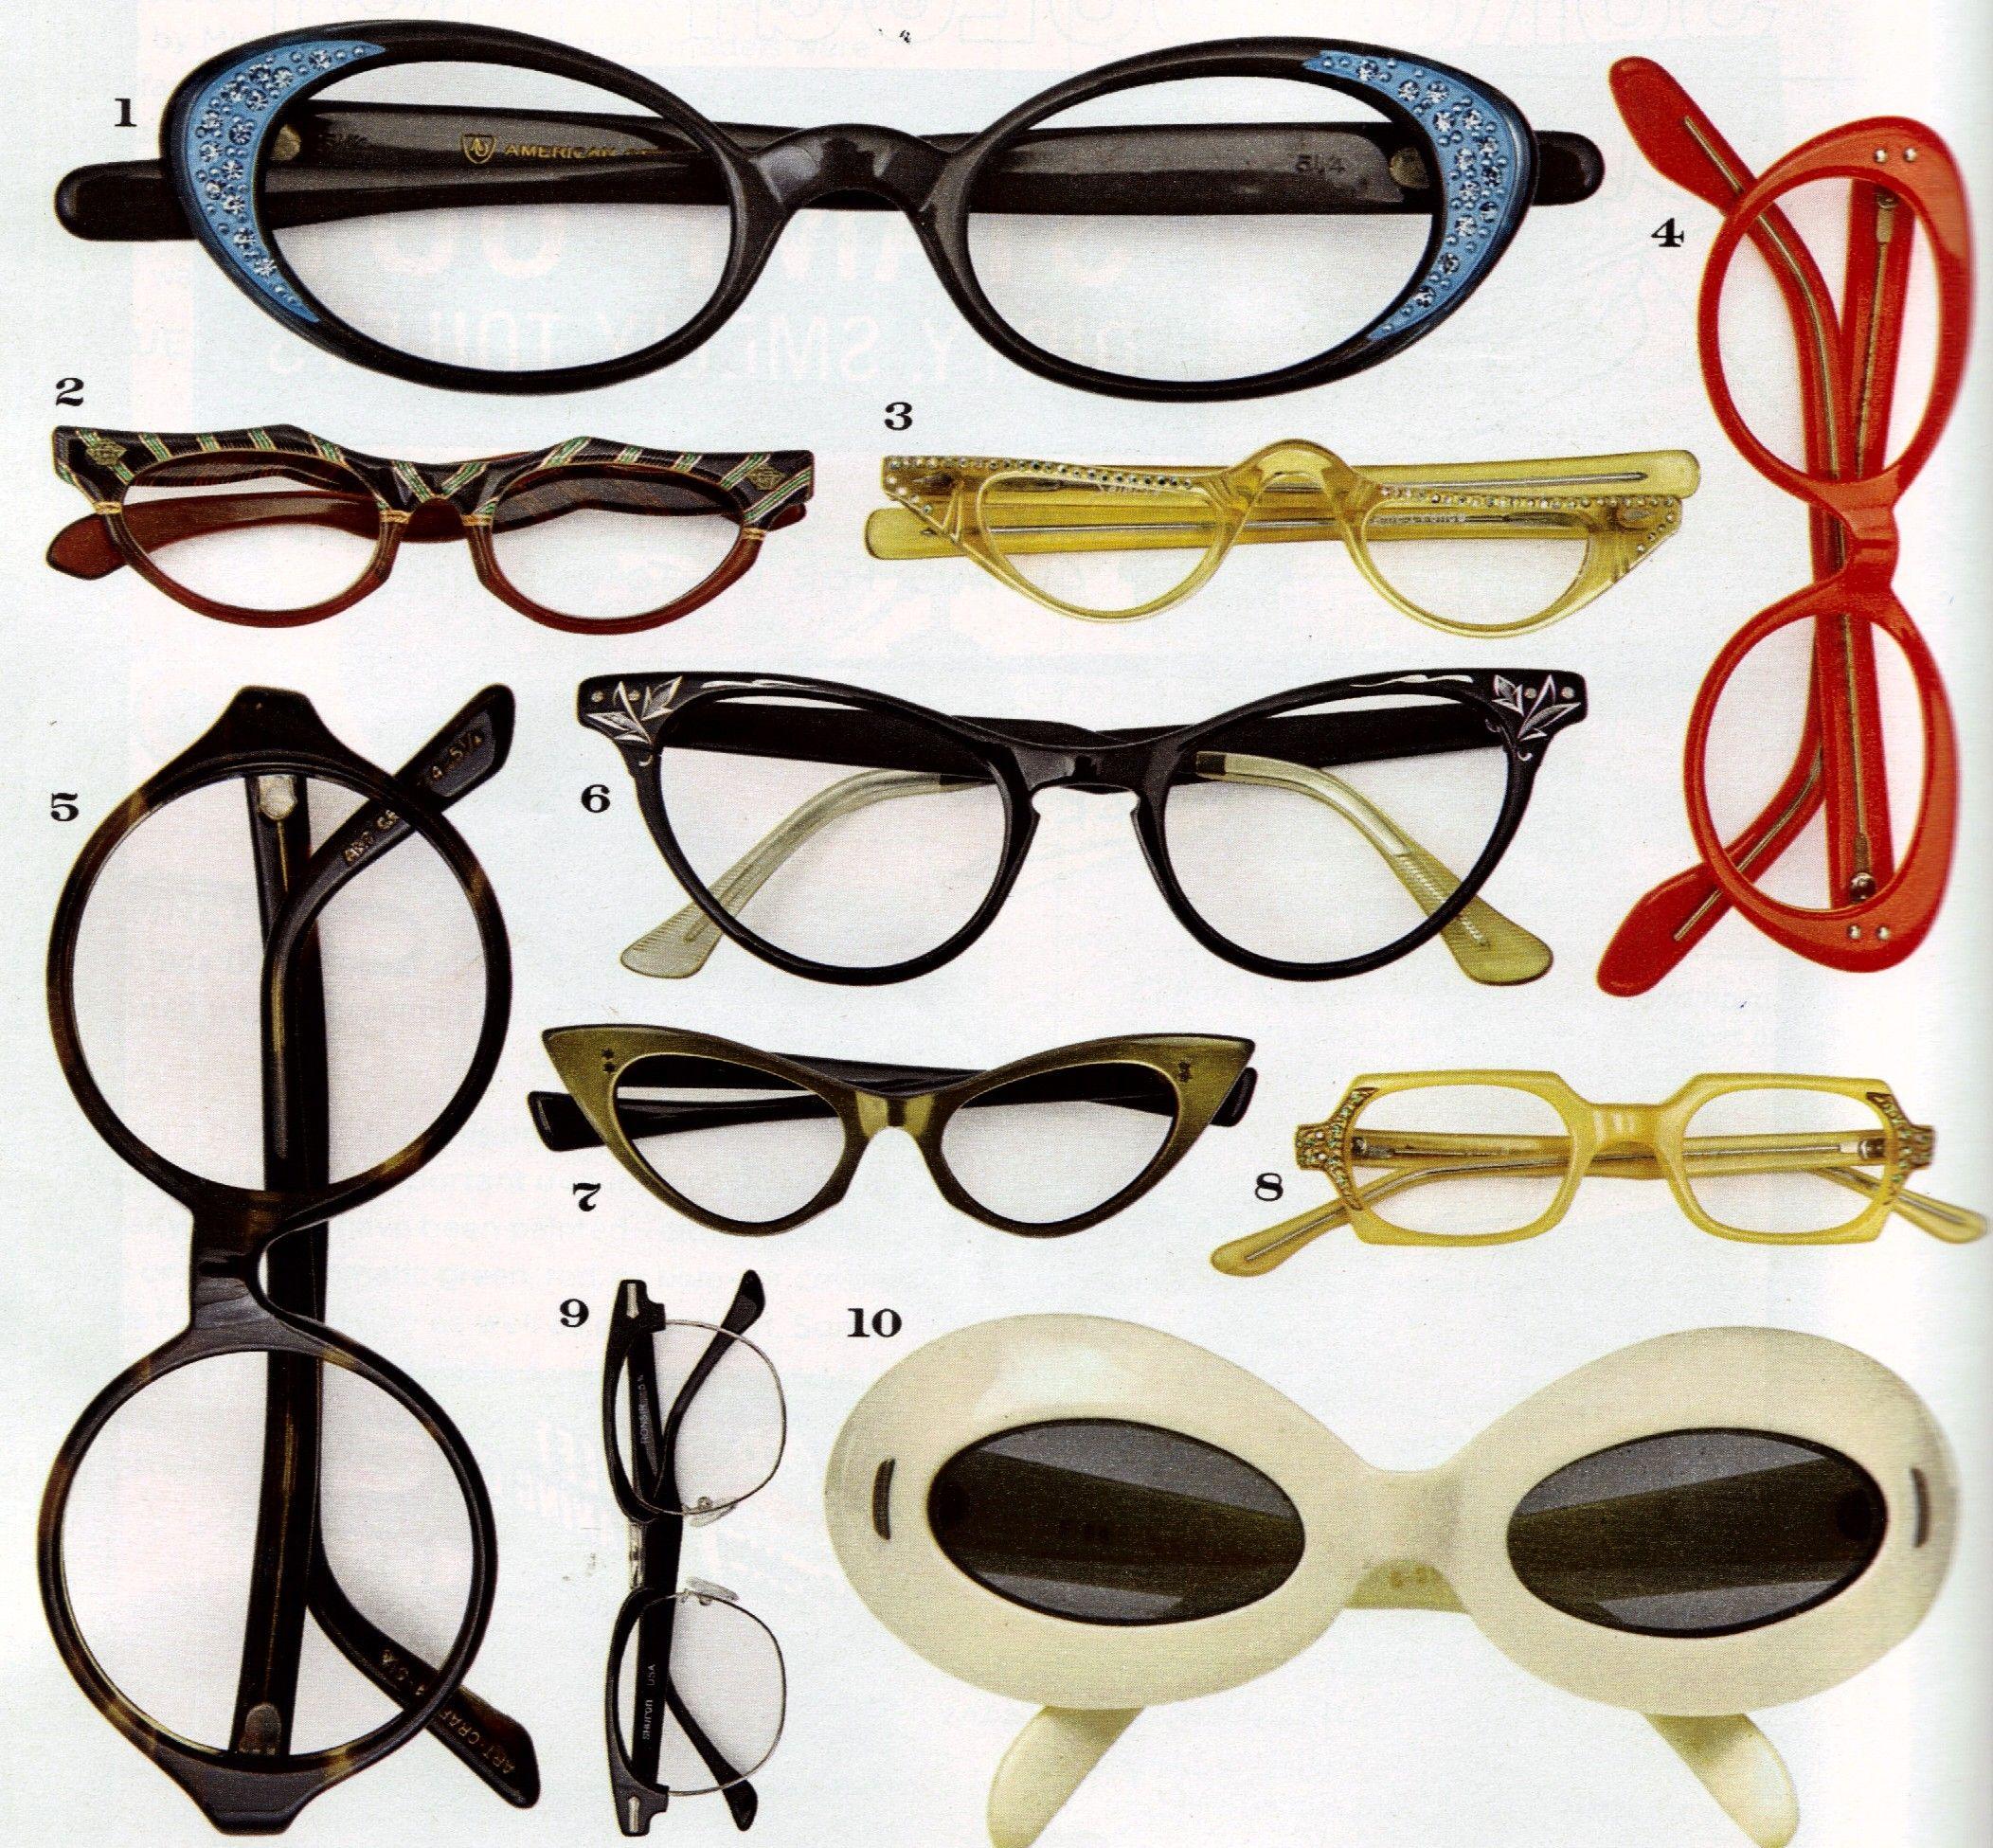 retirement redux injunction bans online sale of glasses in ontario